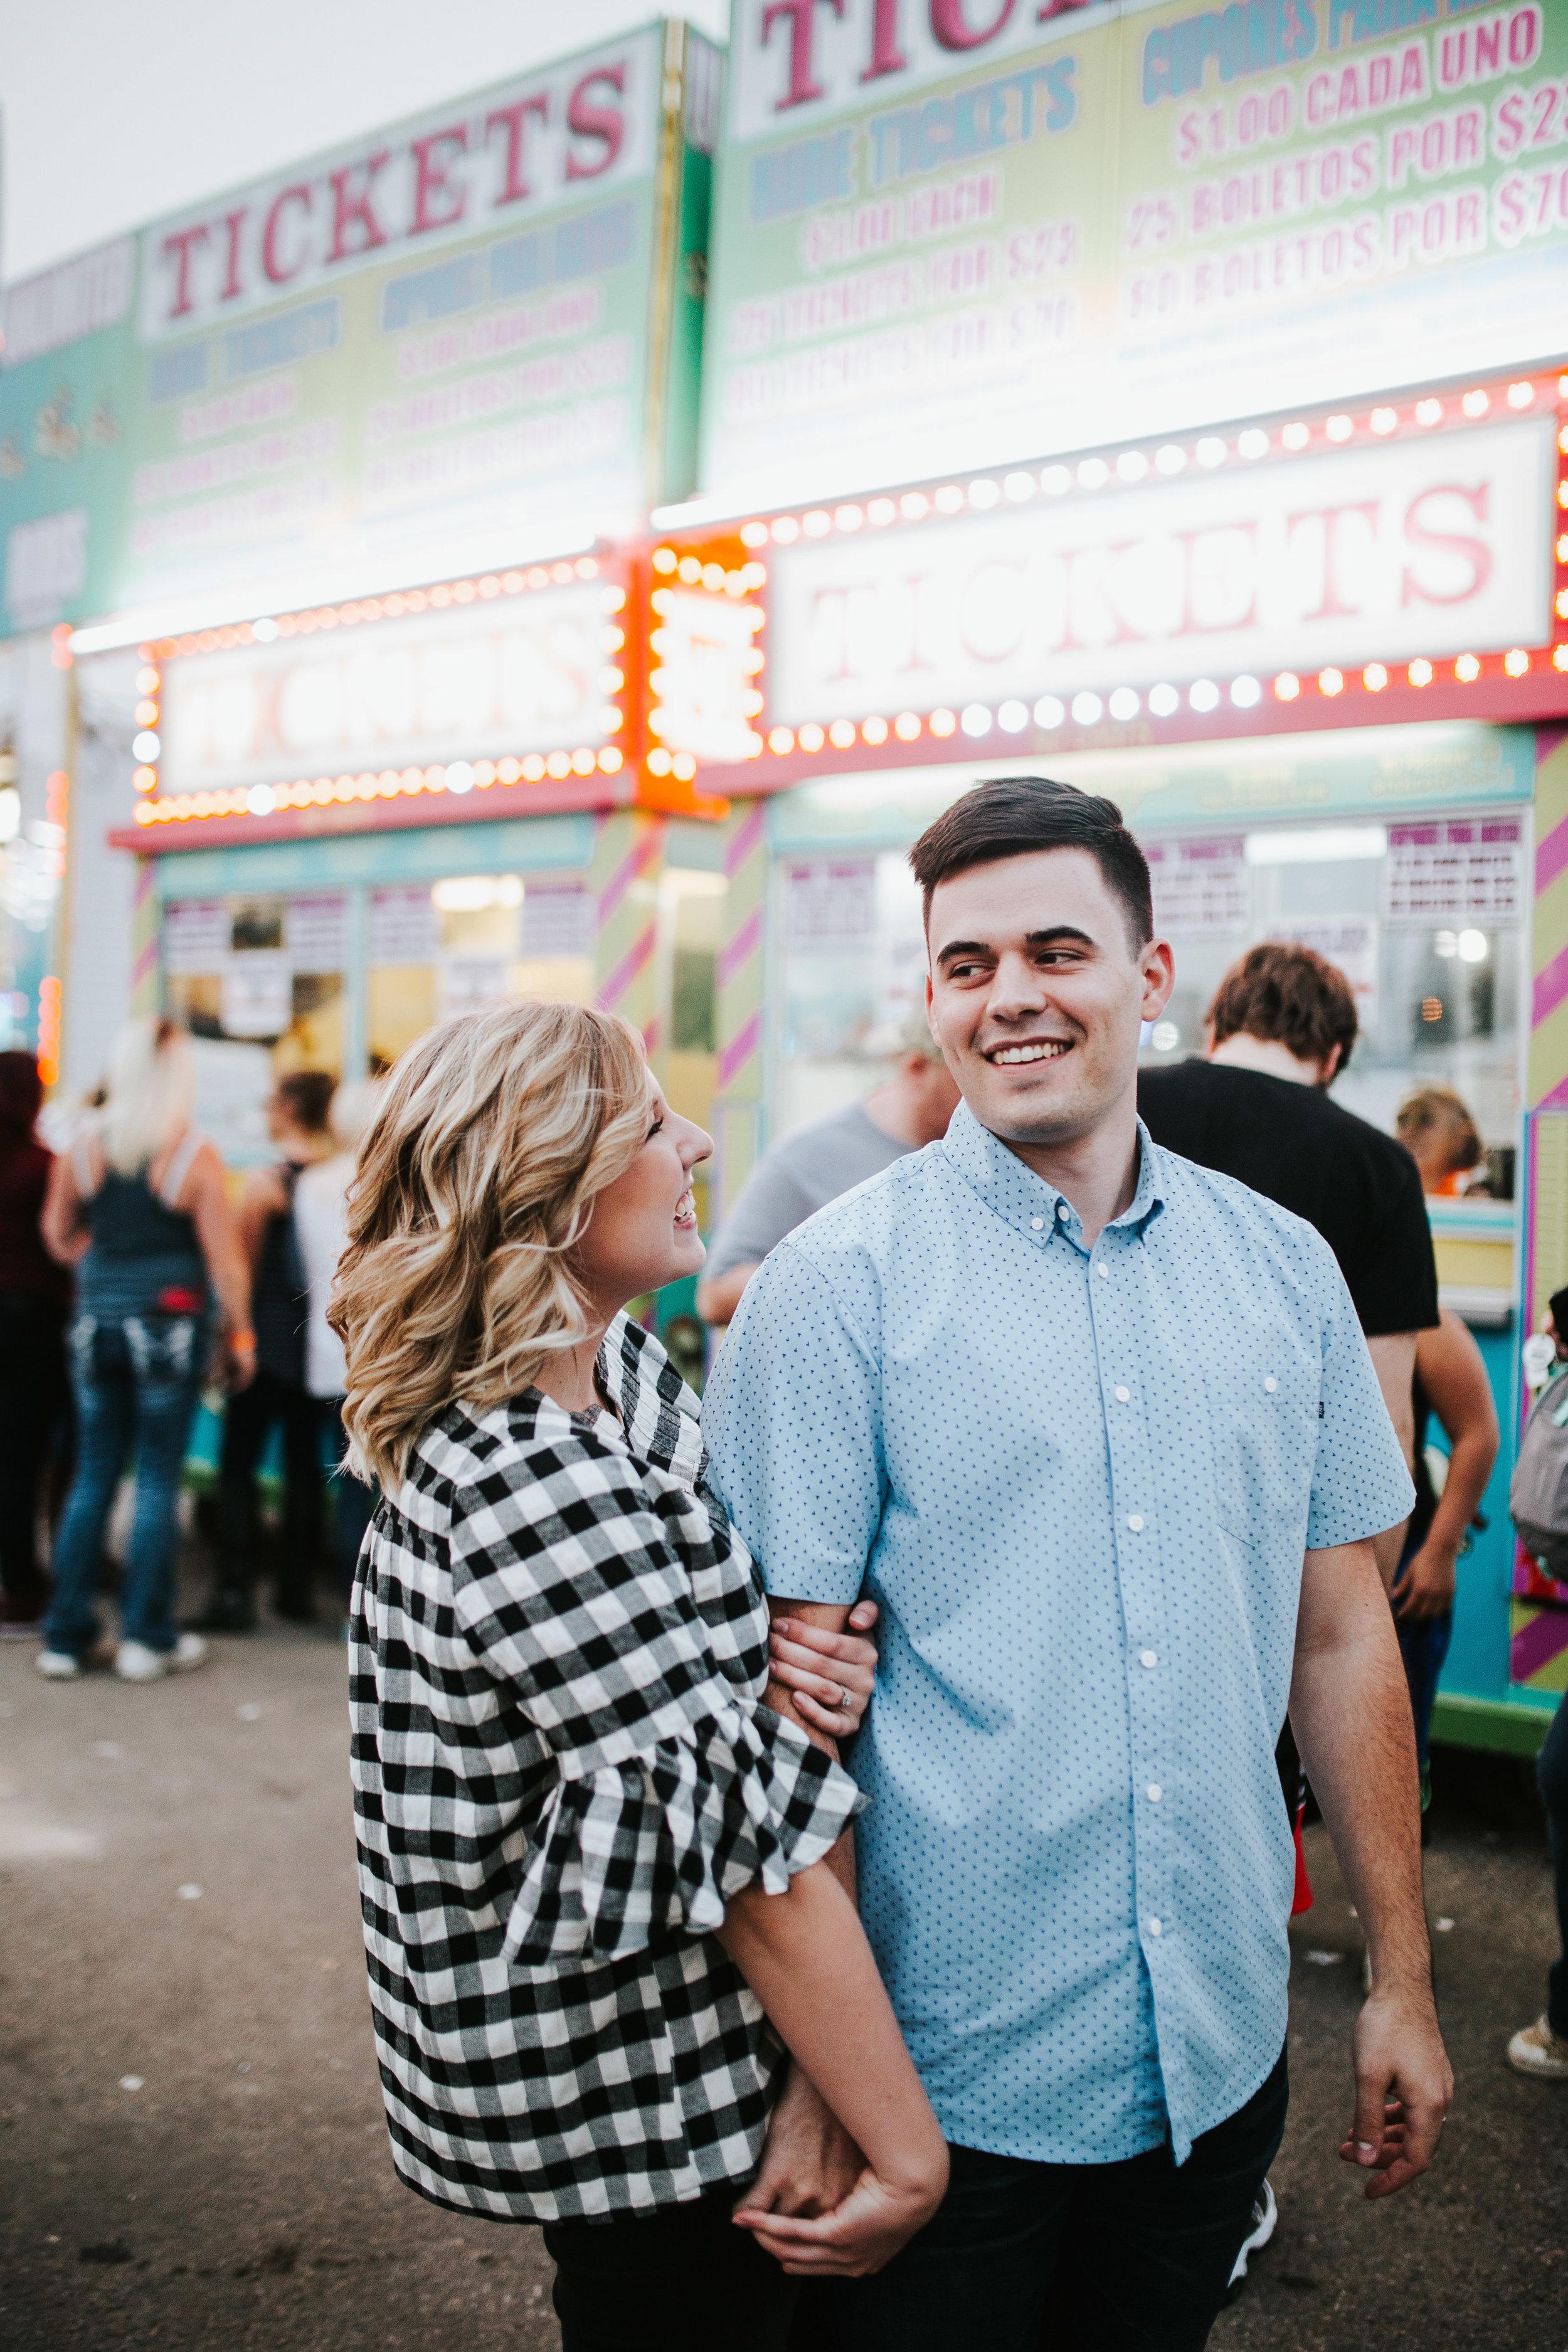 Morgan + Cody Minisession Lookforthelightphotovideo carnival engagements (26 of 148).jpg